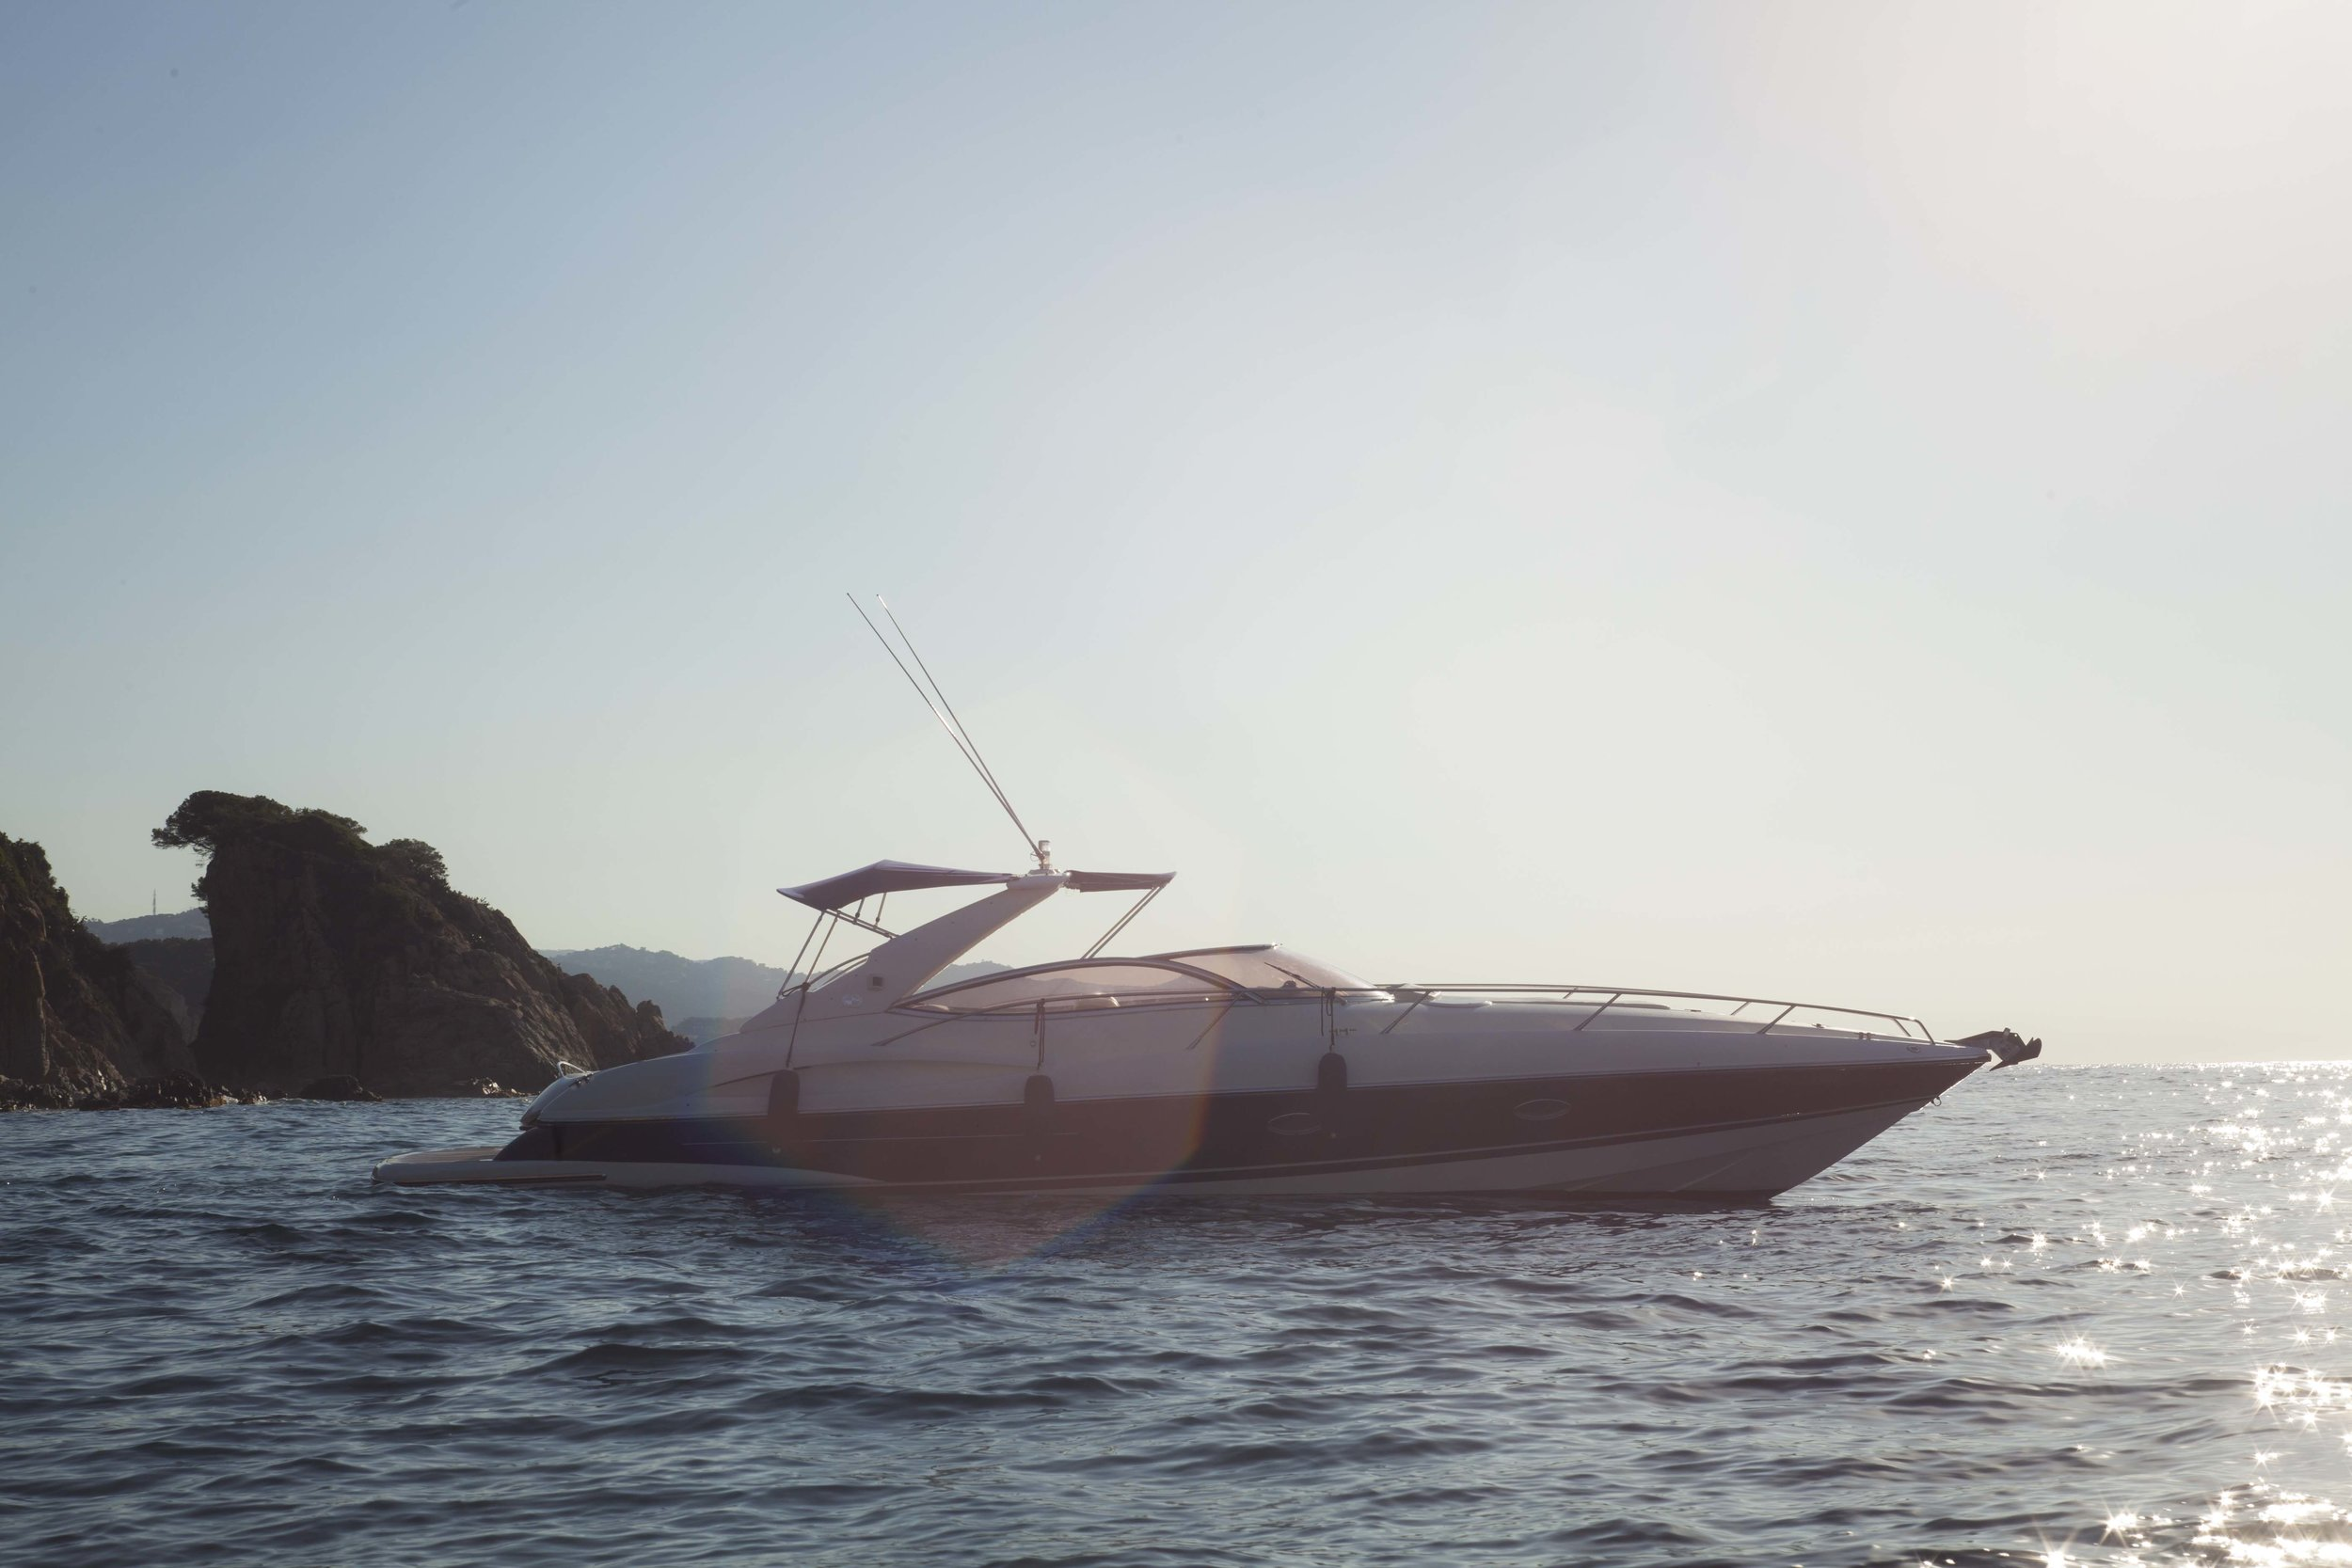 barco_de_alquiler_Sunseeker_en_Costa_Brava2.jpg